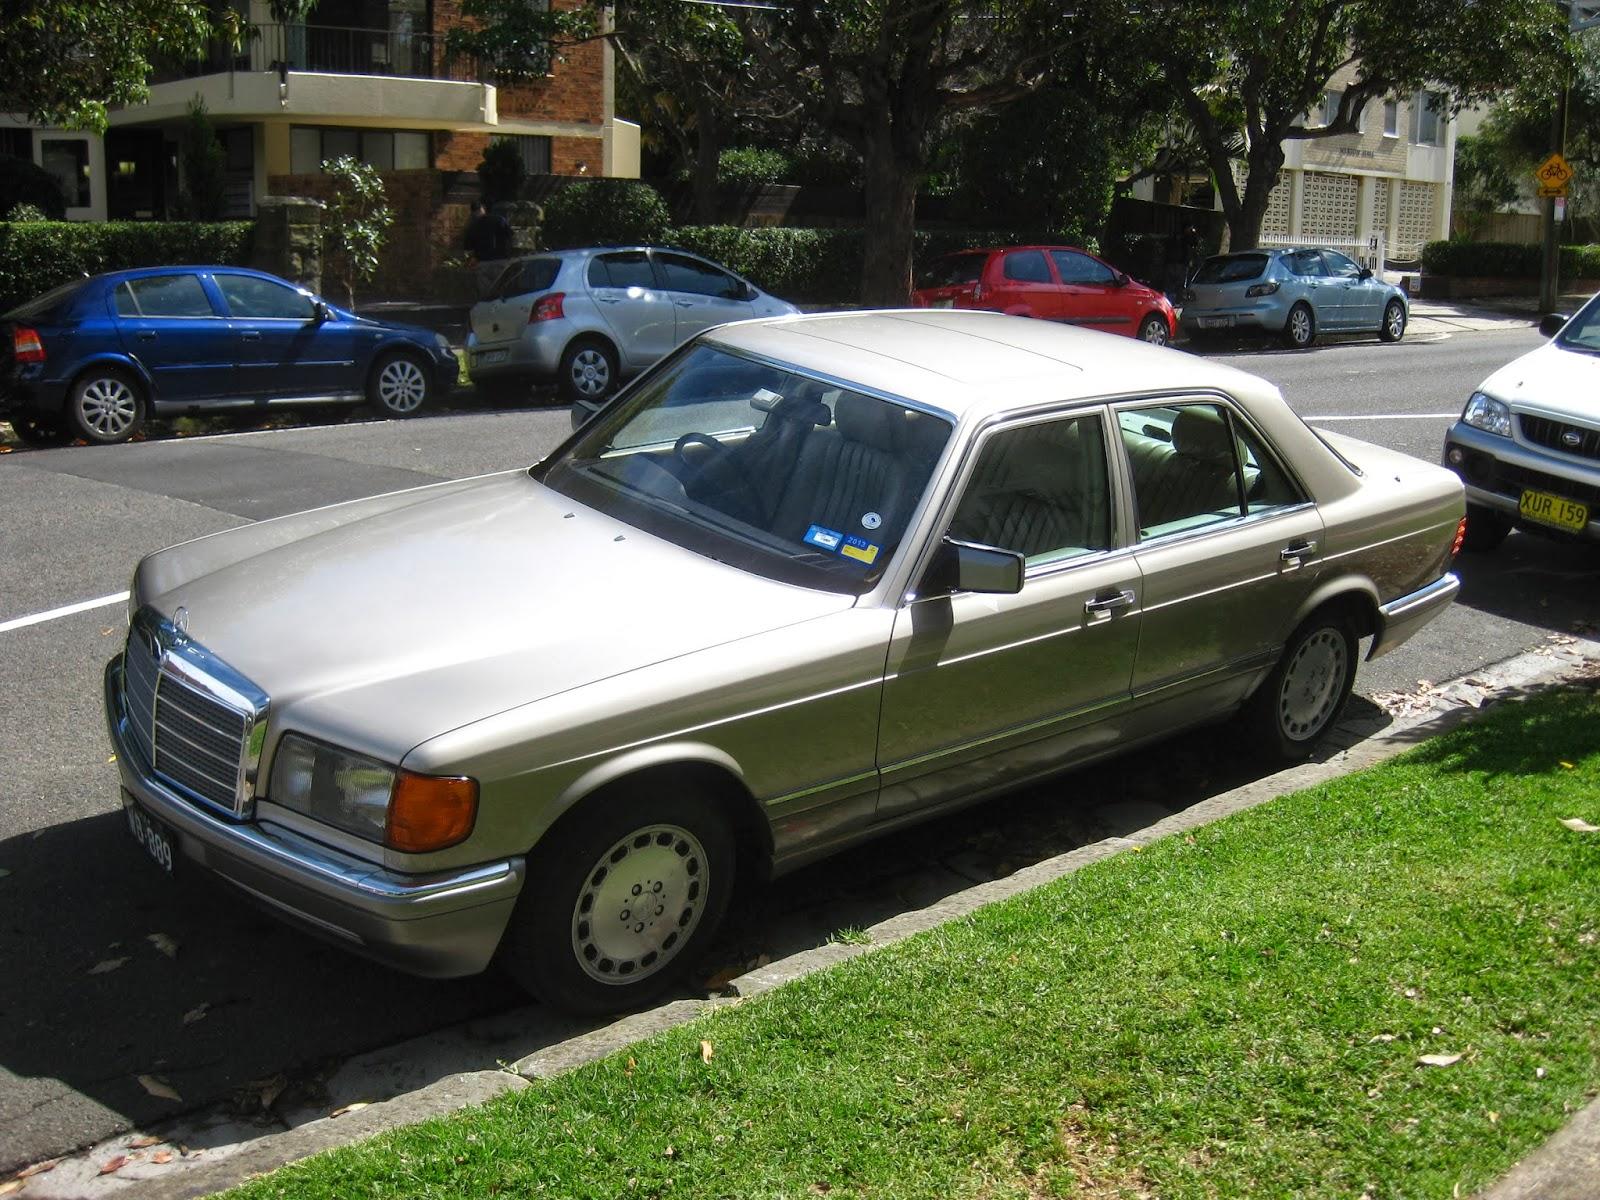 Aussie old parked cars 1987 mercedes benz w126 300 se for 1987 mercedes benz